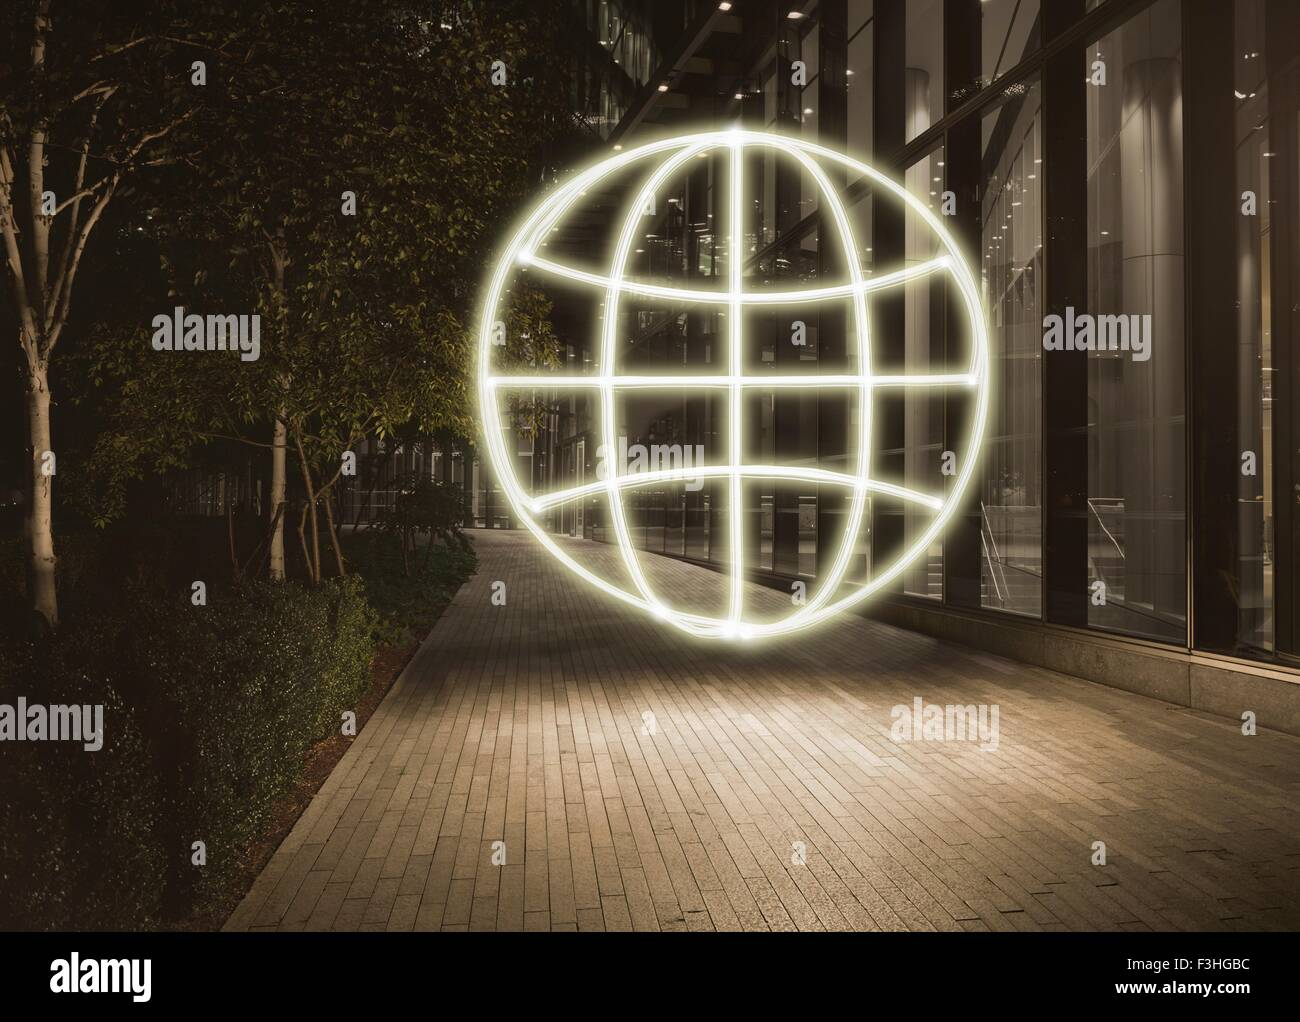 Glowing globe symbol in city at night - Stock Image